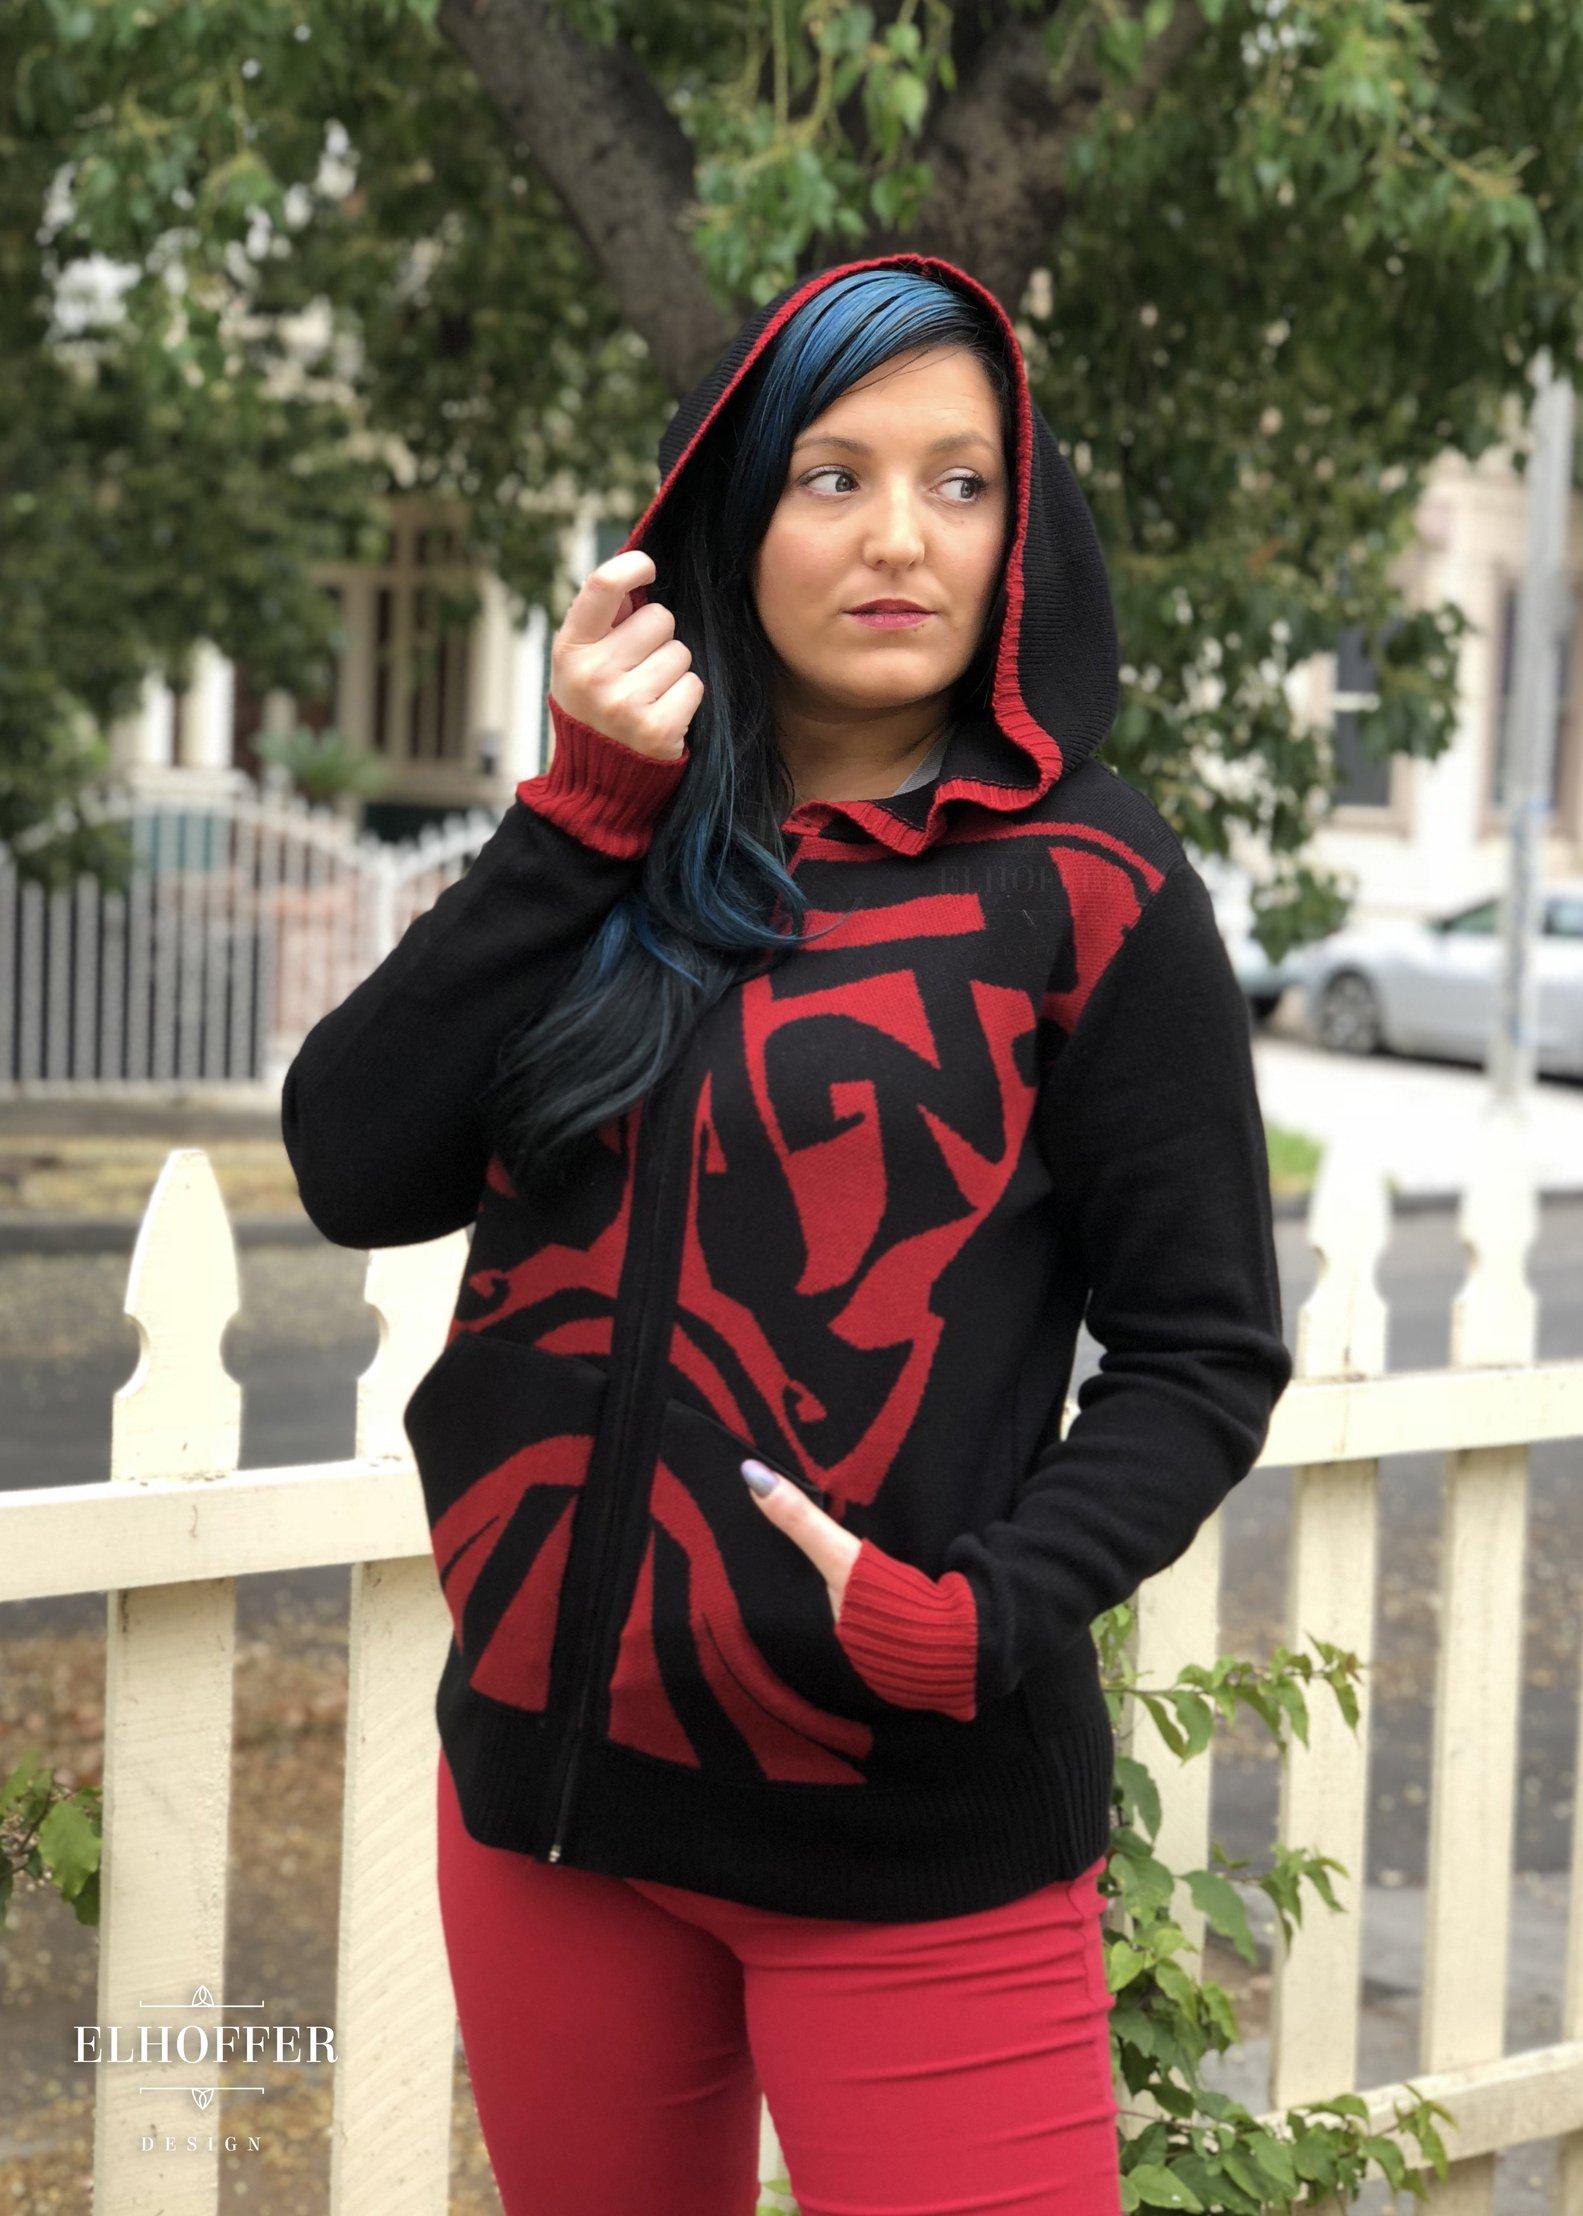 Elhoffer Design - Star Wars Darth Maul Inspired Galactic Shadow Knit Hoodie